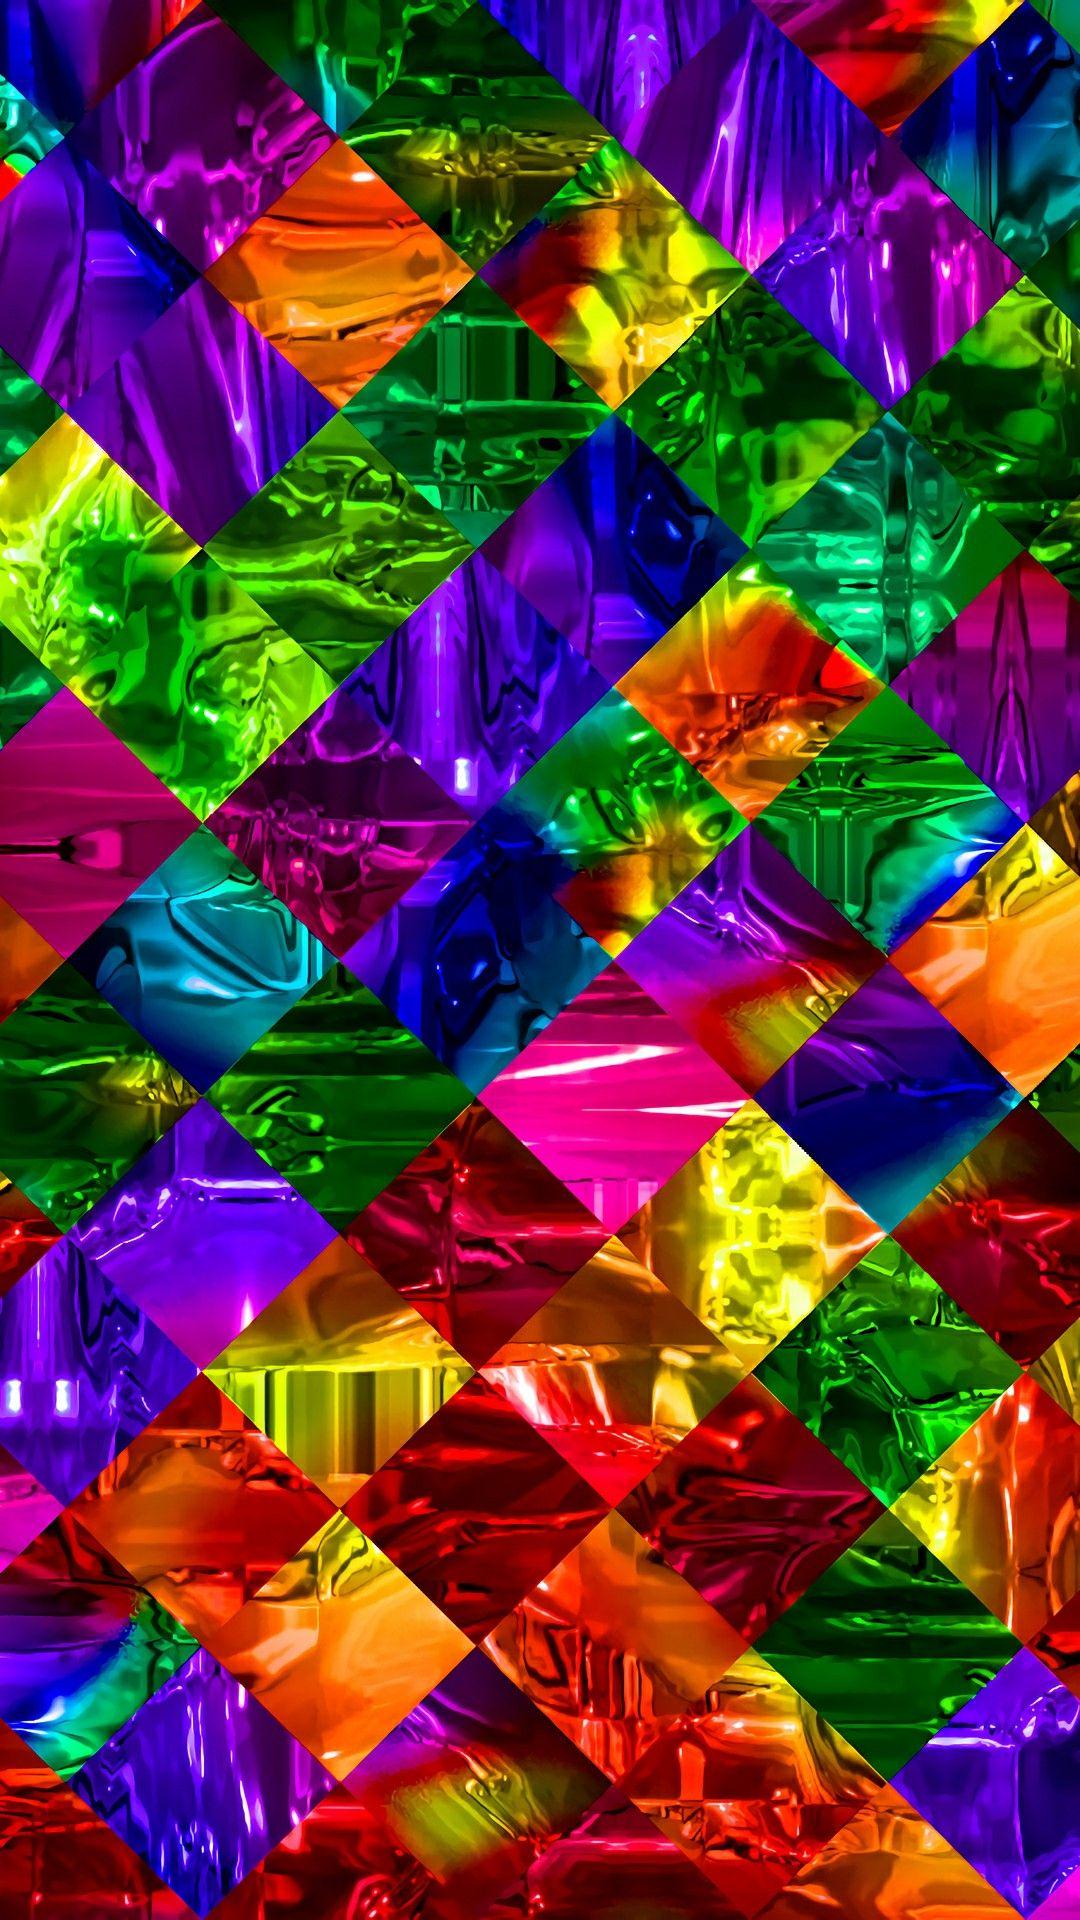 Pin By Louise Solum On Art Rainbow Wallpaper Colorful Wallpaper Flower Wallpaper